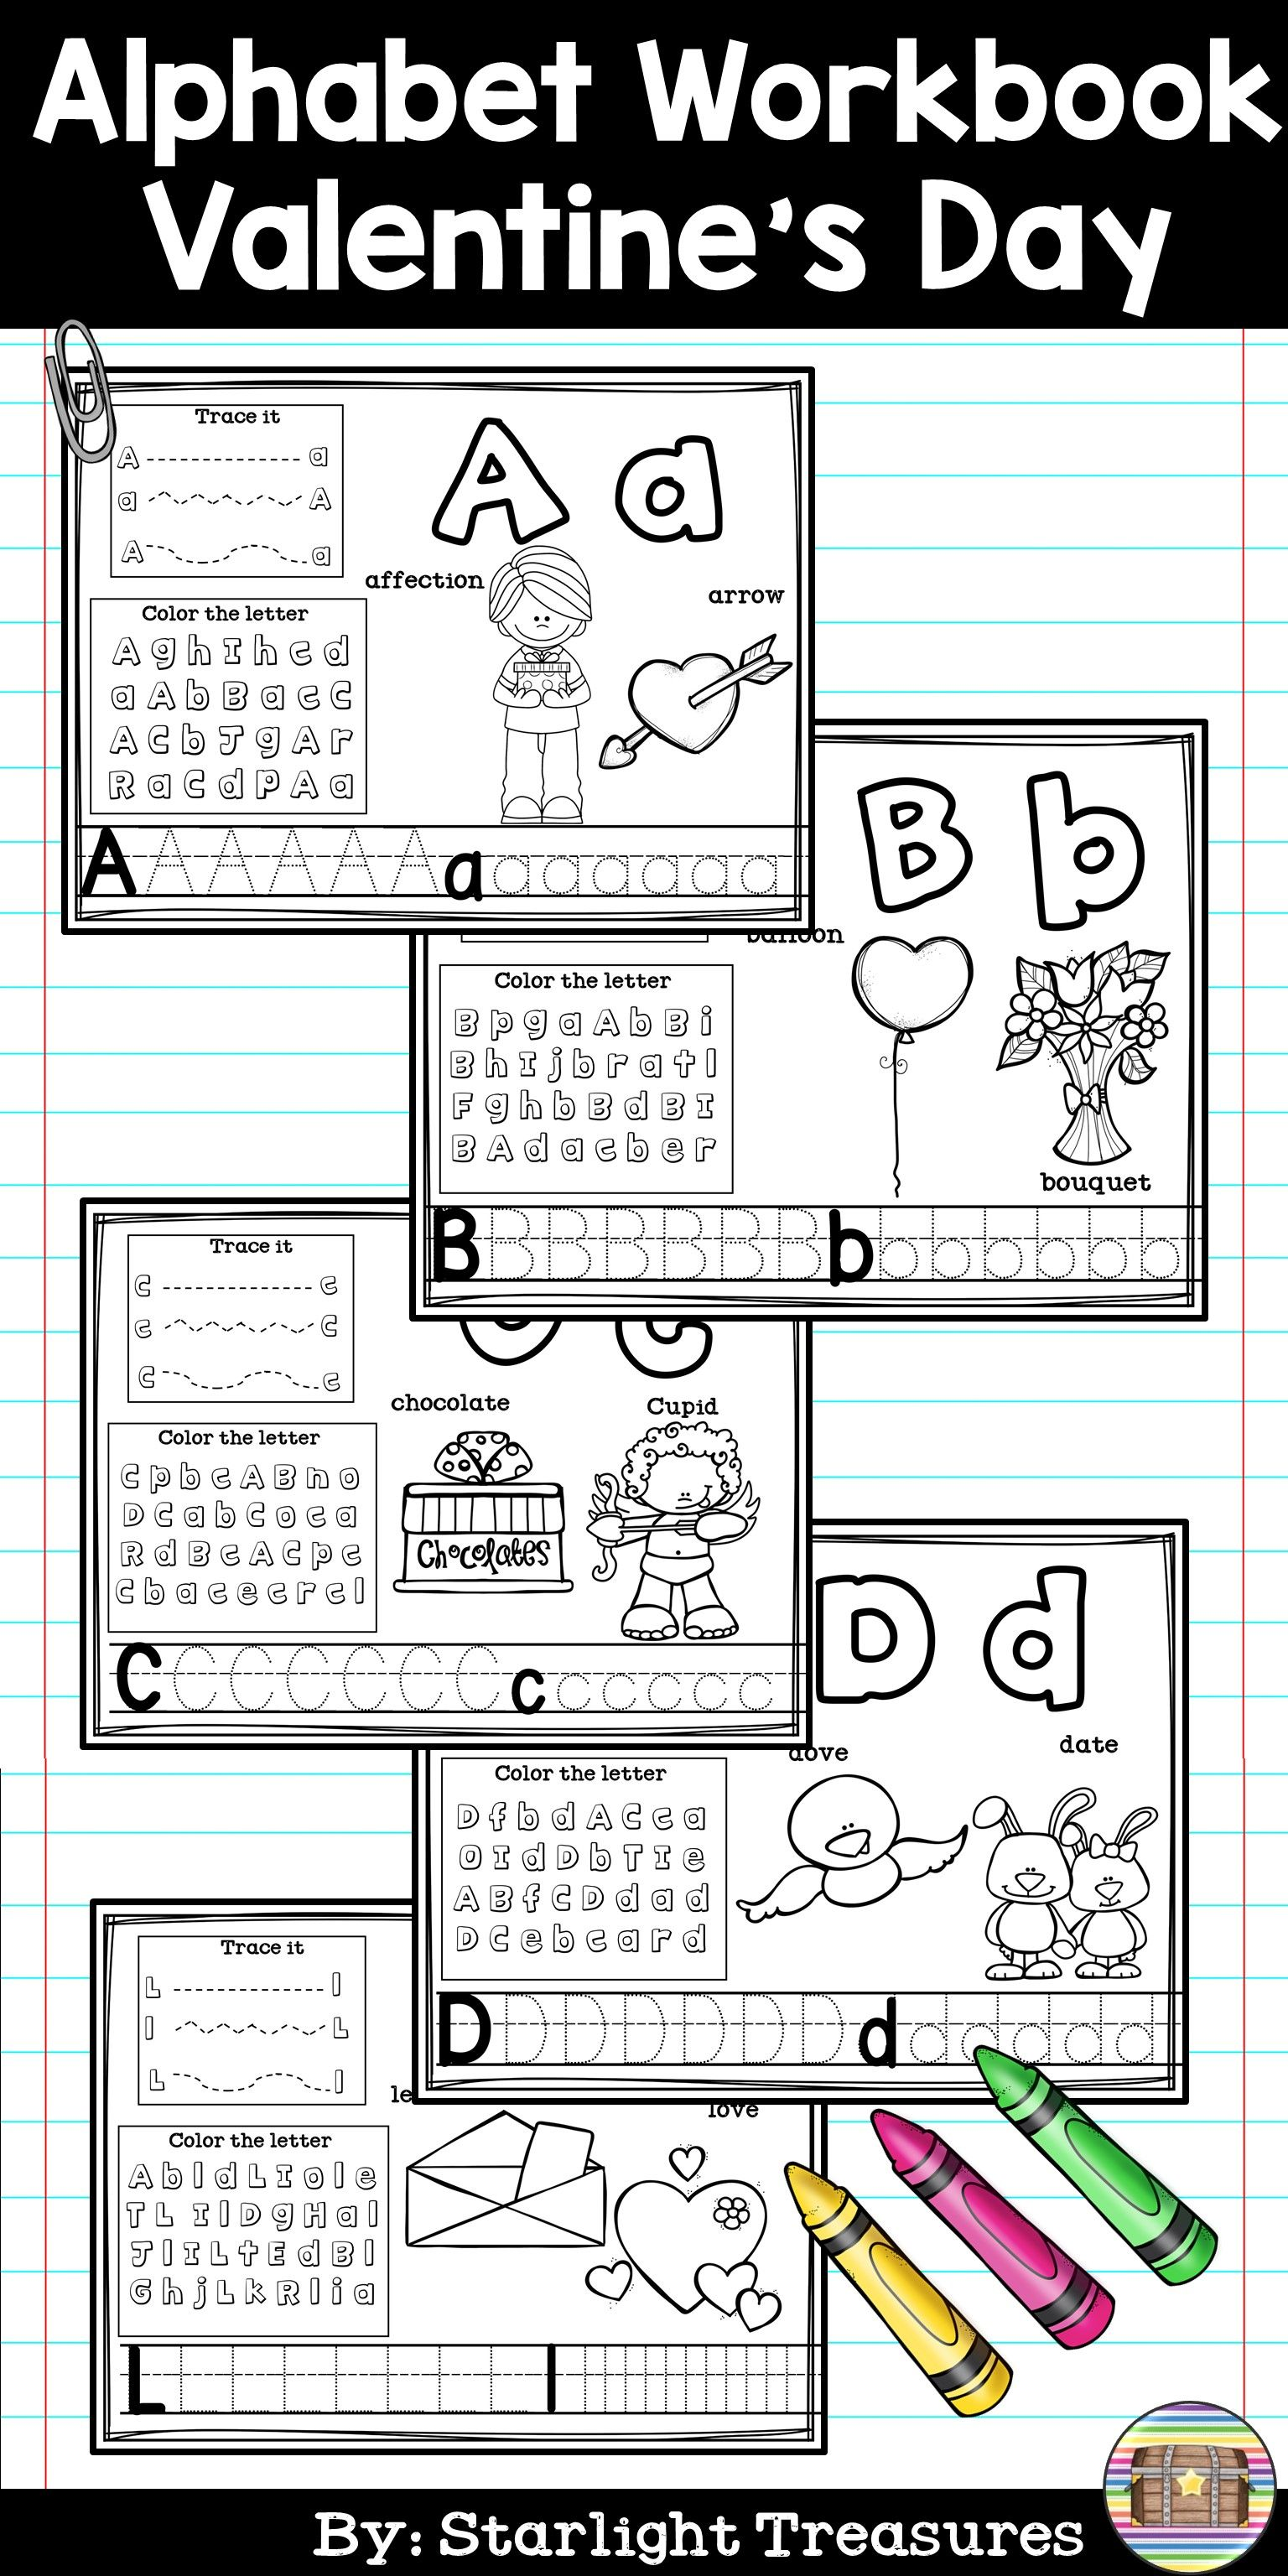 Alphabet Workbook Worksheets A Z Valentine S Day Theme